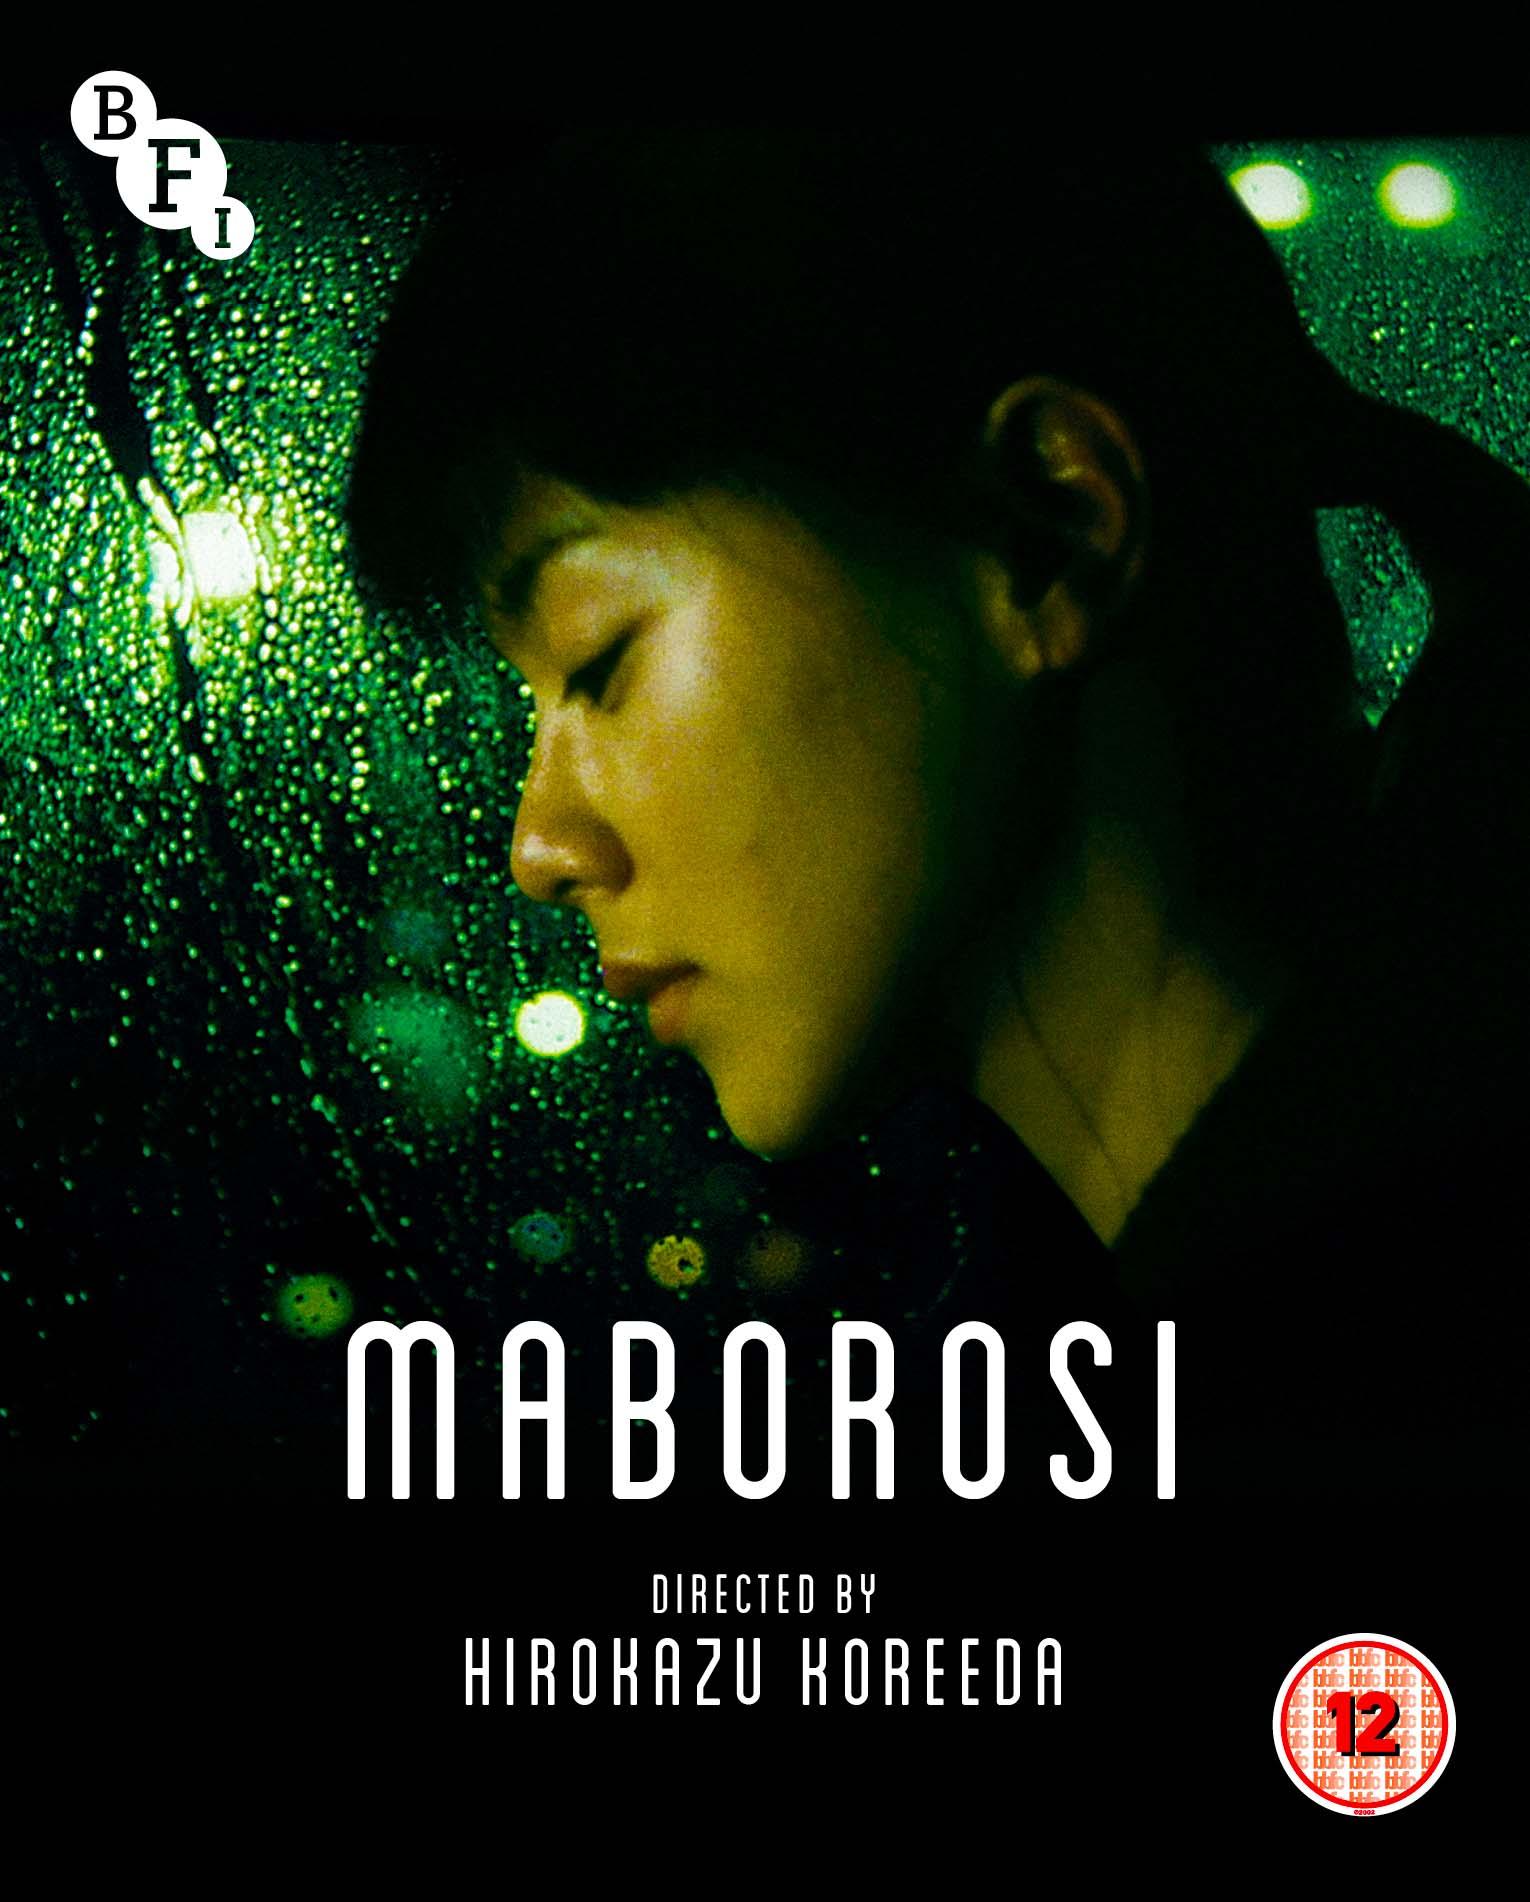 Buy PRE-ORDER Maborosi (Blu-ray)